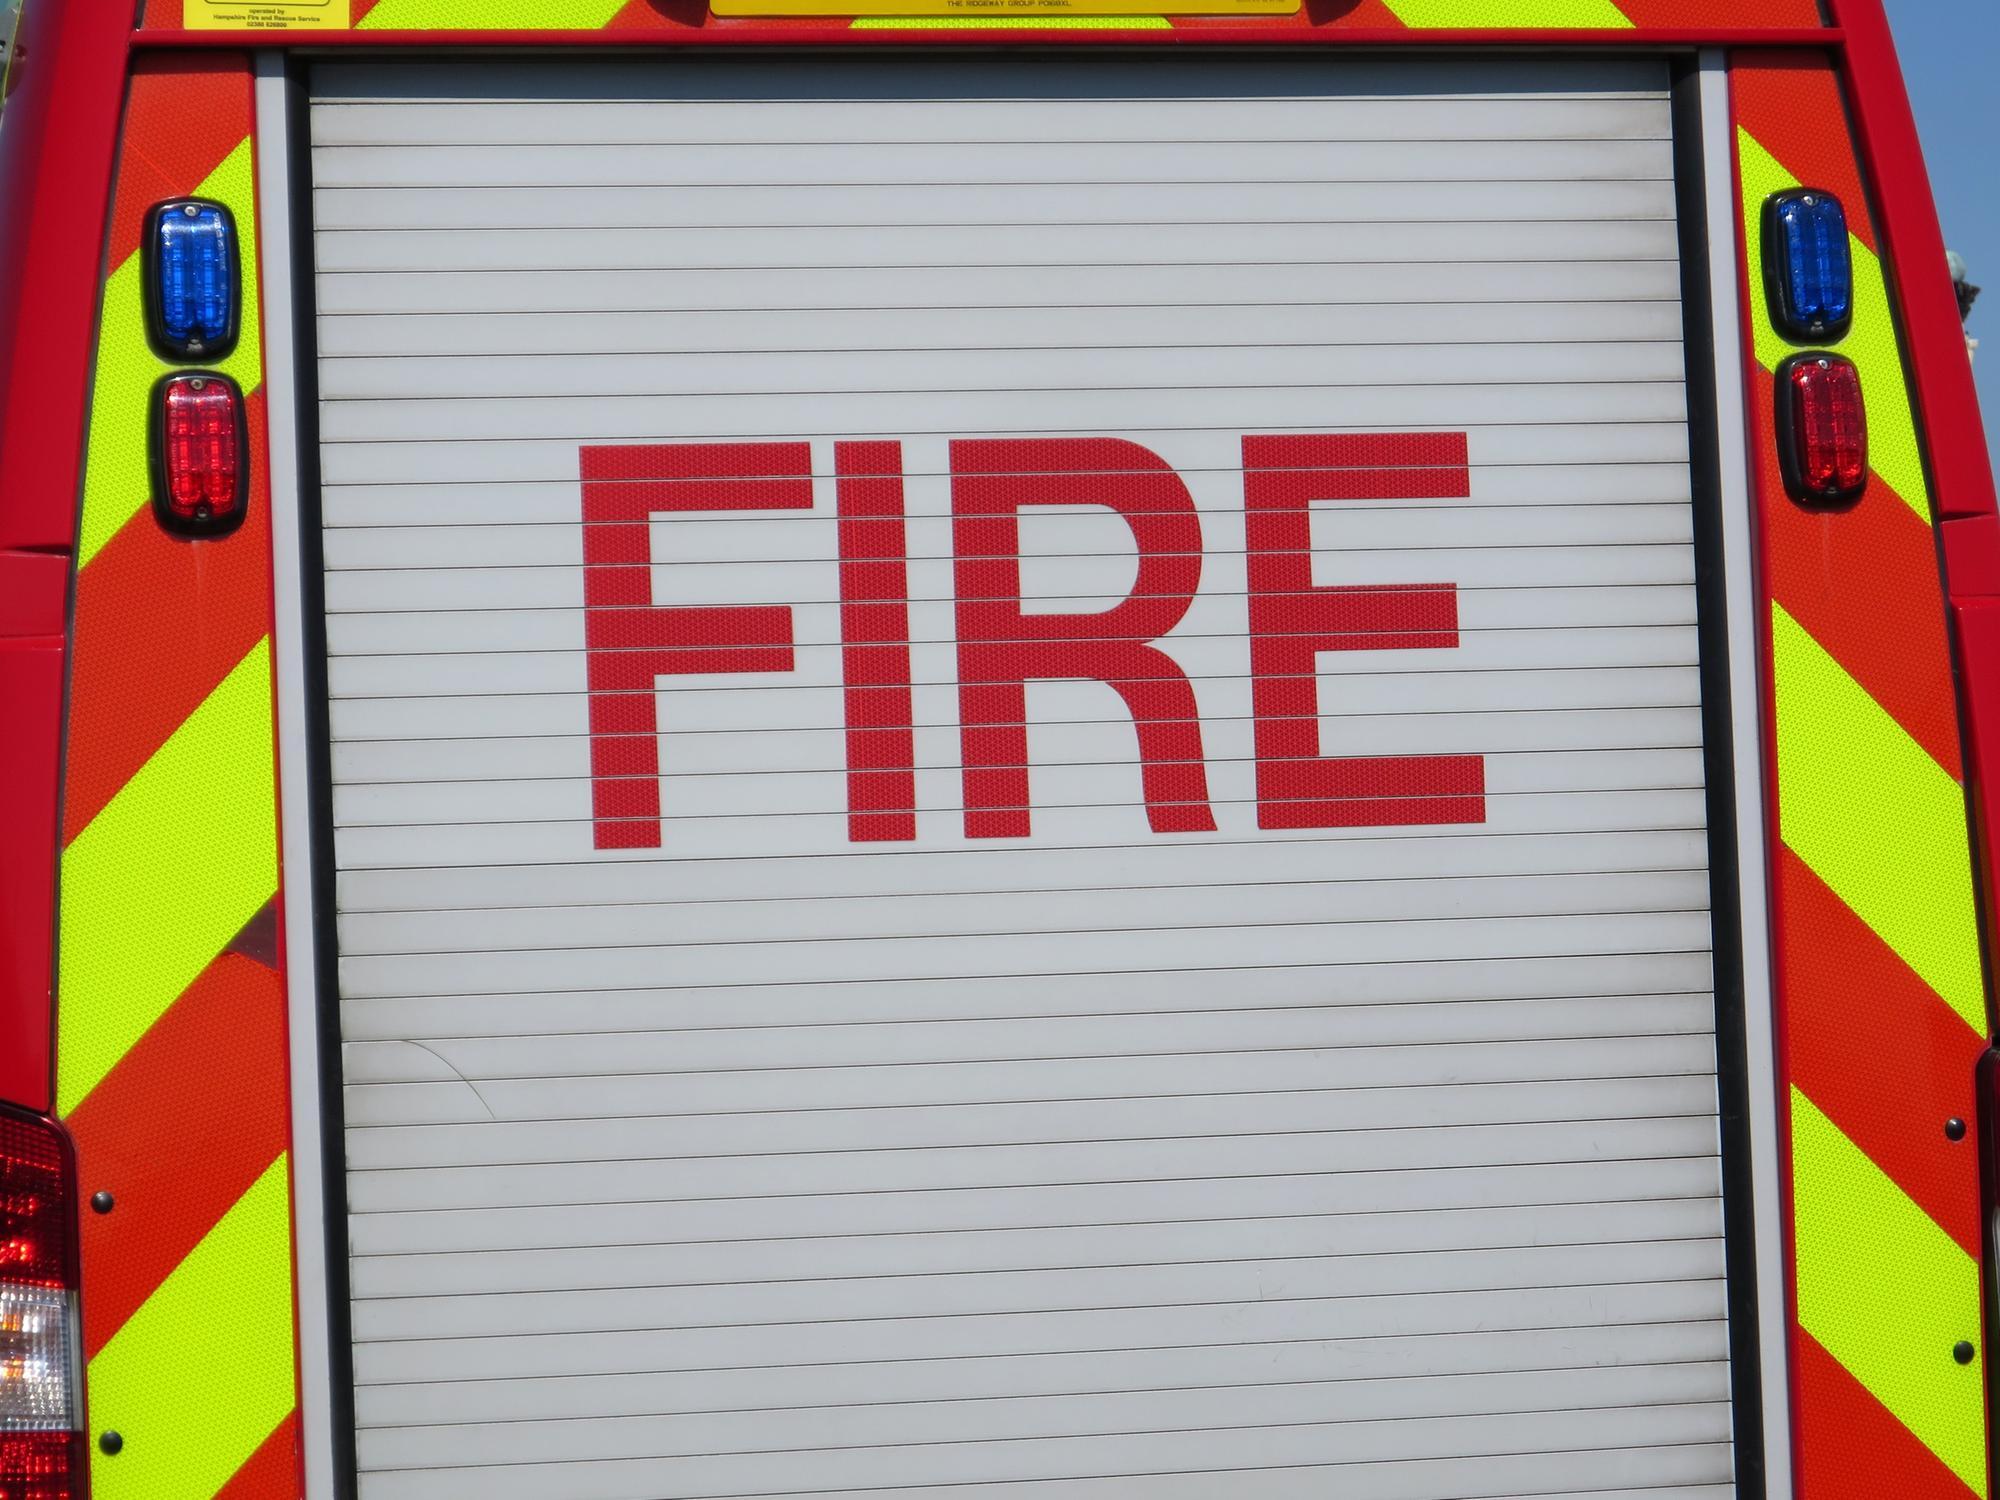 Fire crews battle large blaze involving outdoor 'man cave' in Paulsgrove